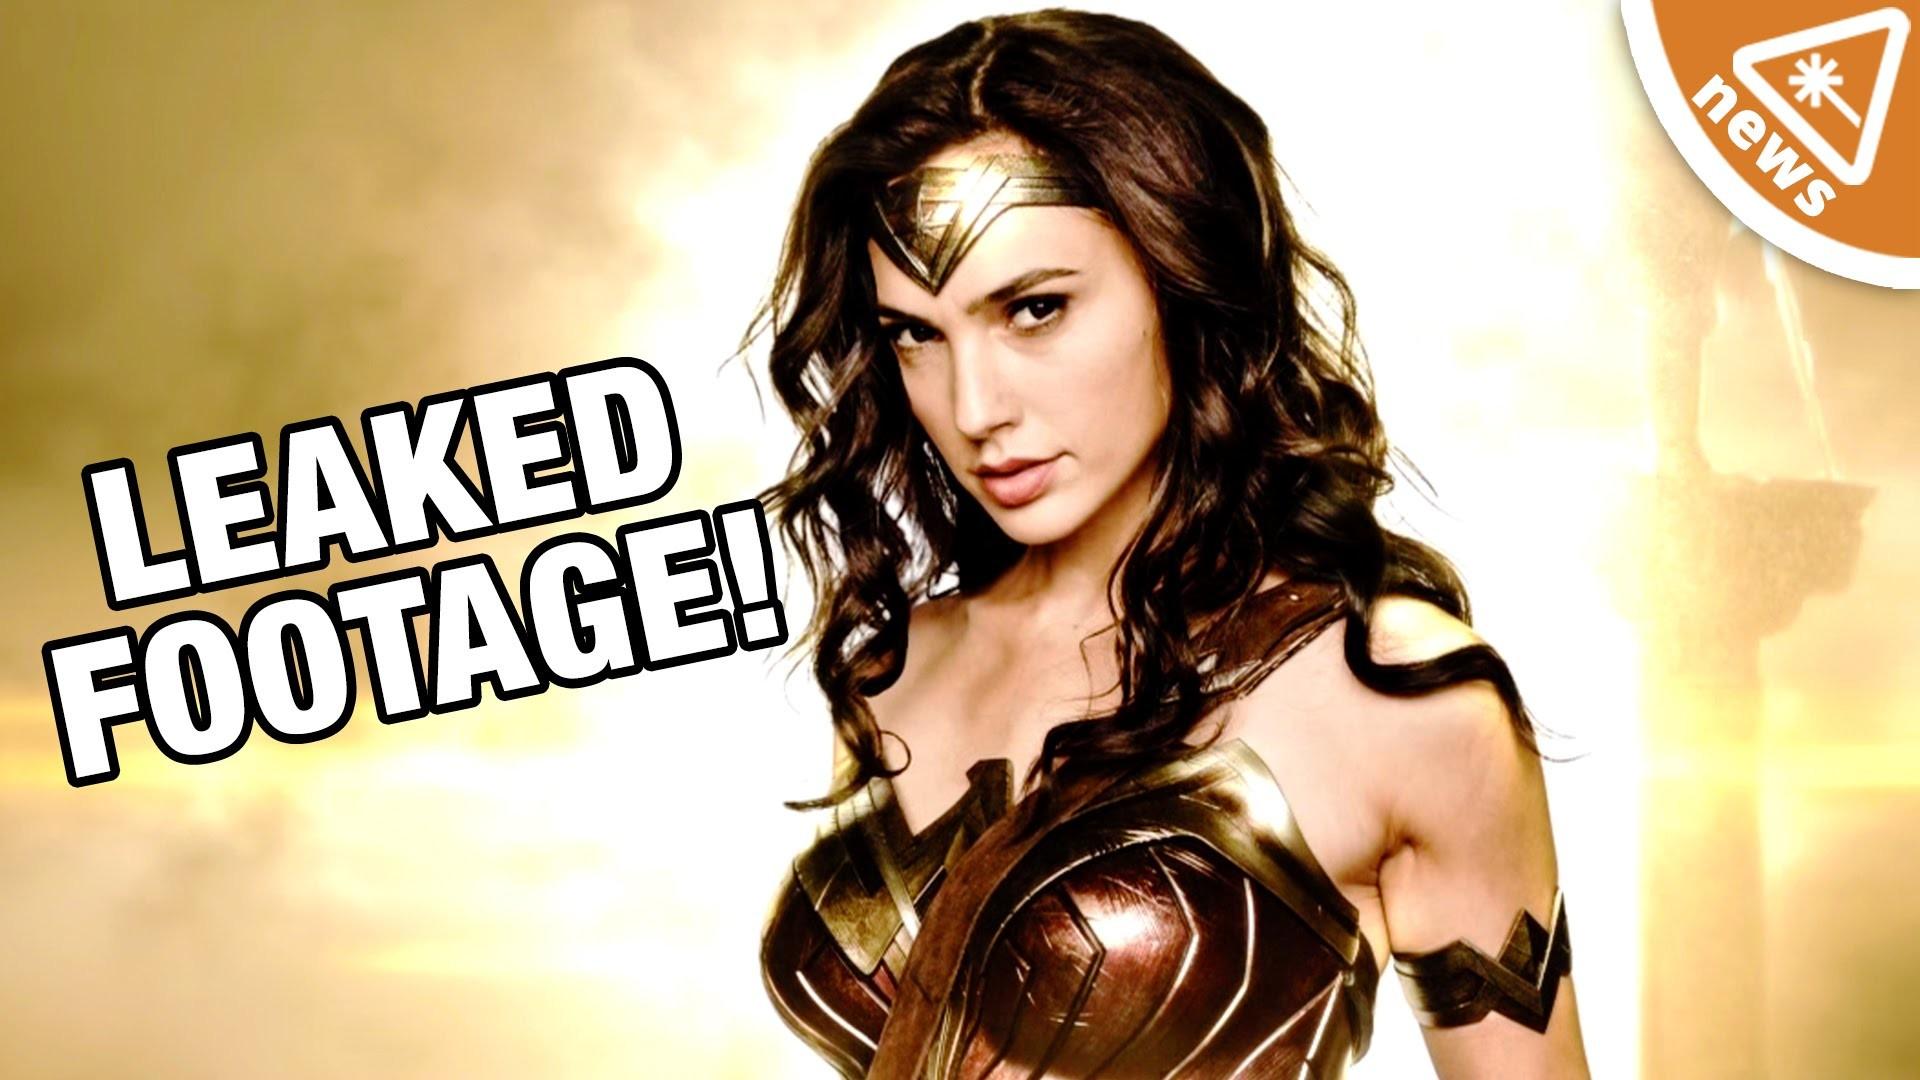 First Leaked Wonder Woman Footage Revealed! (Nerdist News w/ Jessica Chobot)  – YouTube